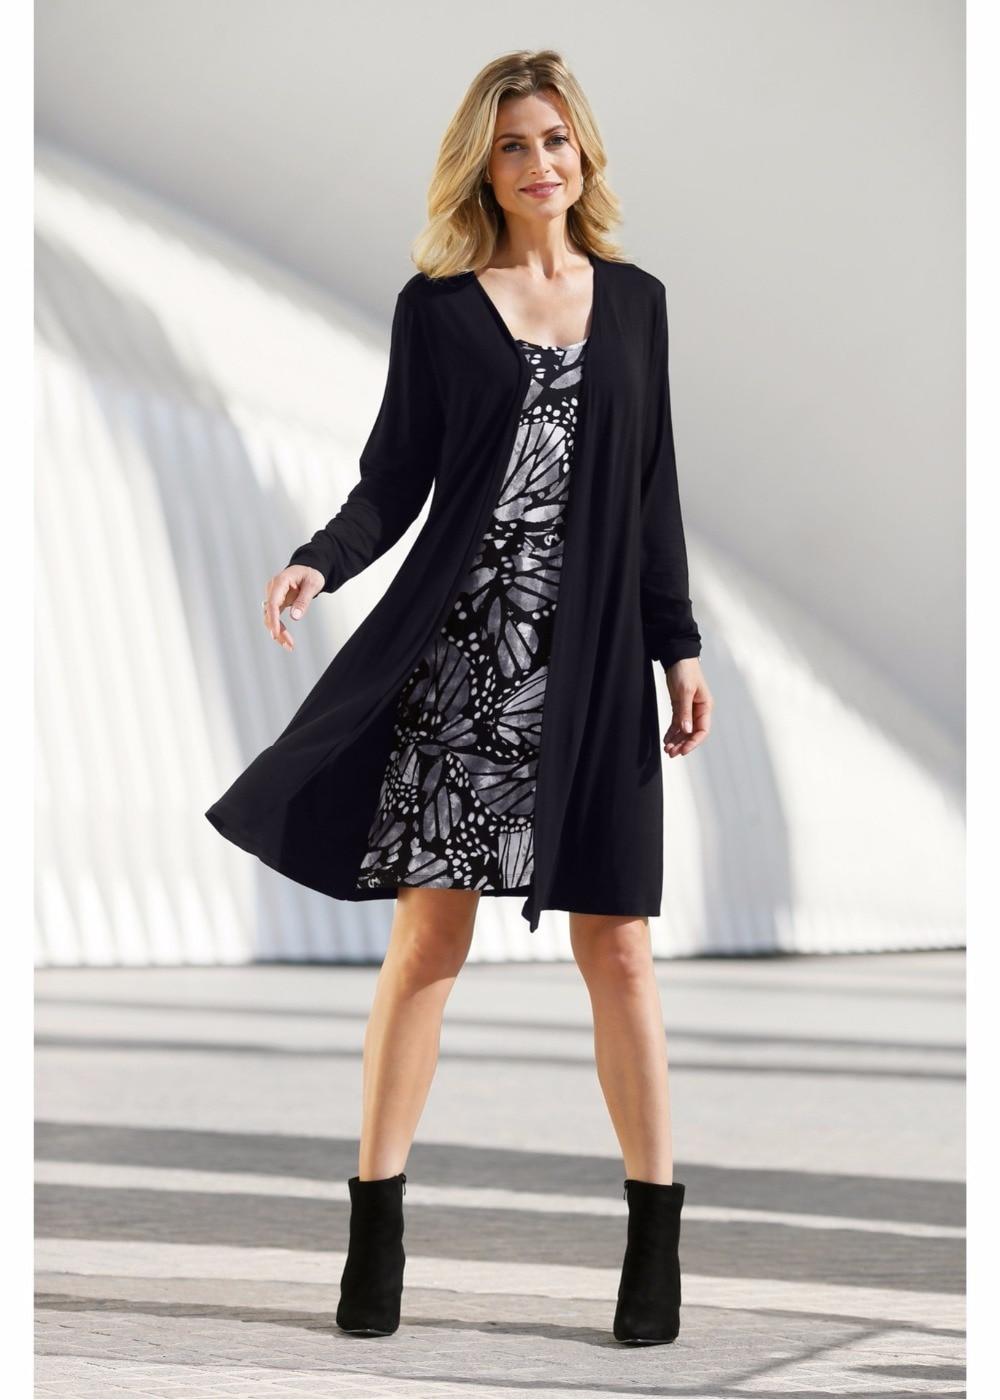 HOLMAI Female Vestidos Women Warm Winter Long Sleeve Mini Dress Vintage Casual Fake Two Pieces Thicken Short Dresses S~2XL